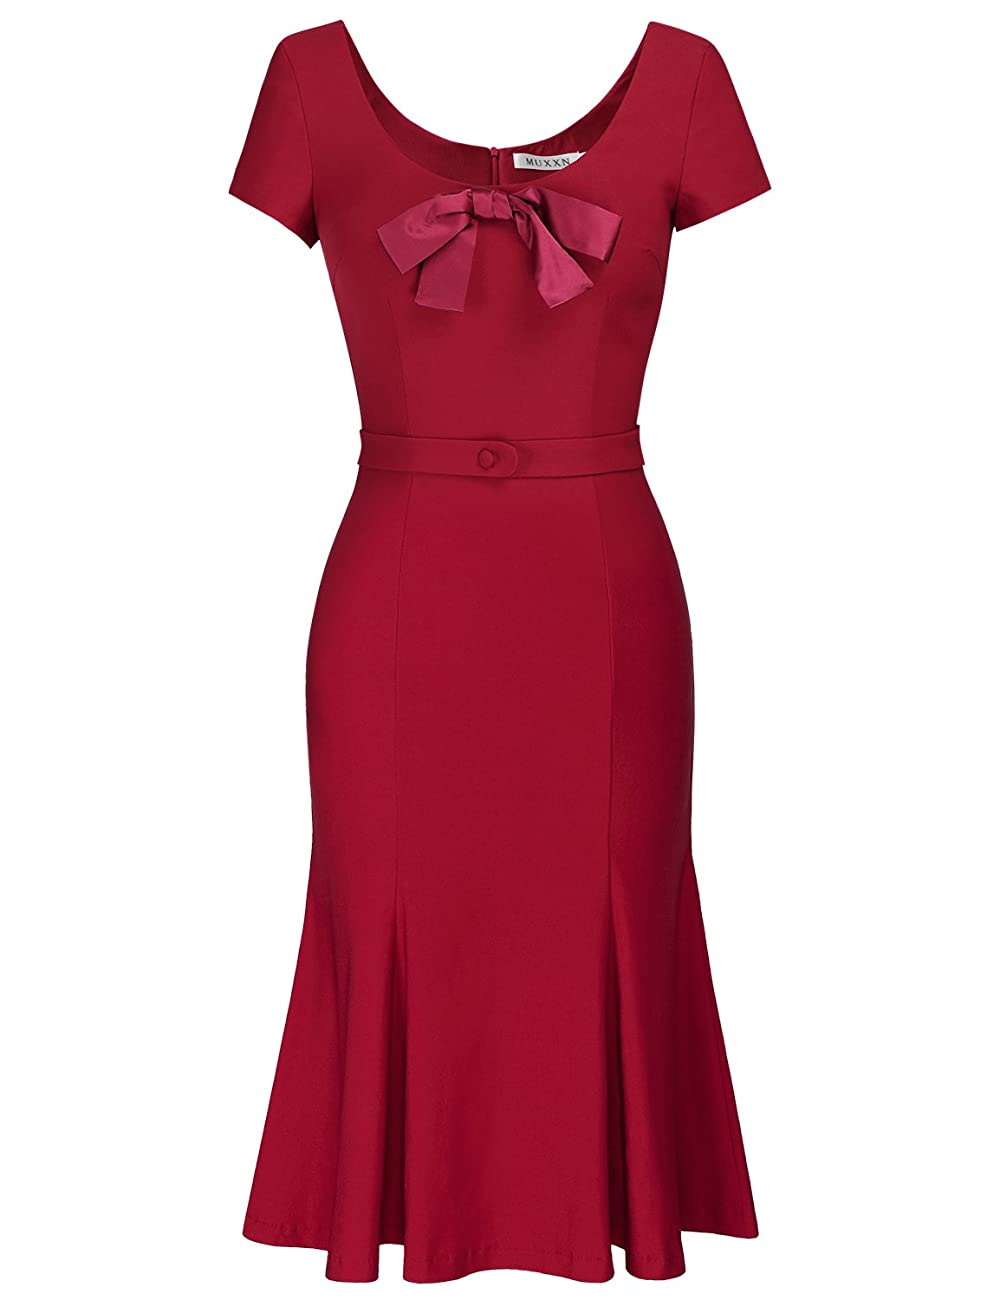 MUXXN Women's Cap Sleeve Vintage Scoop Neck Bodycon Pencil Dress 0